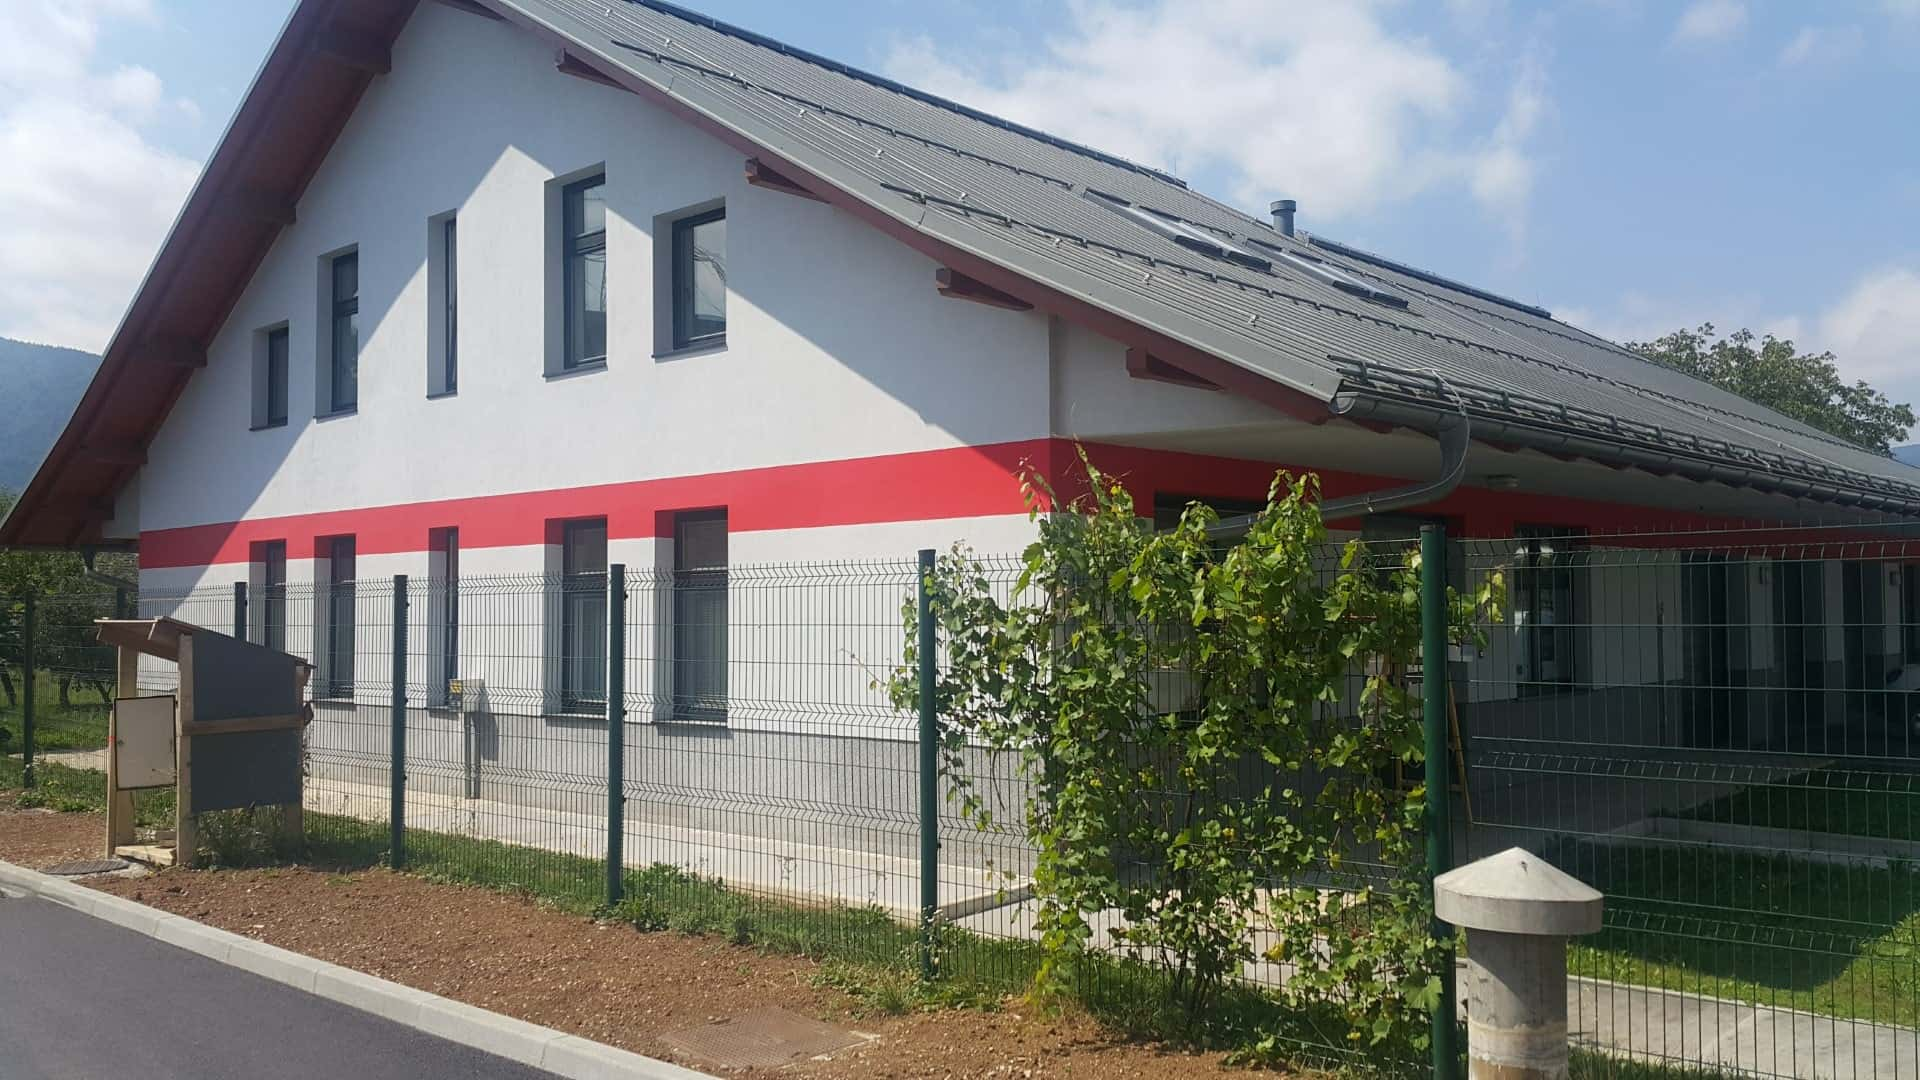 Permal doo reference Rtp radovljica in trzic -2 2019 iMode d.o.o. (Large)